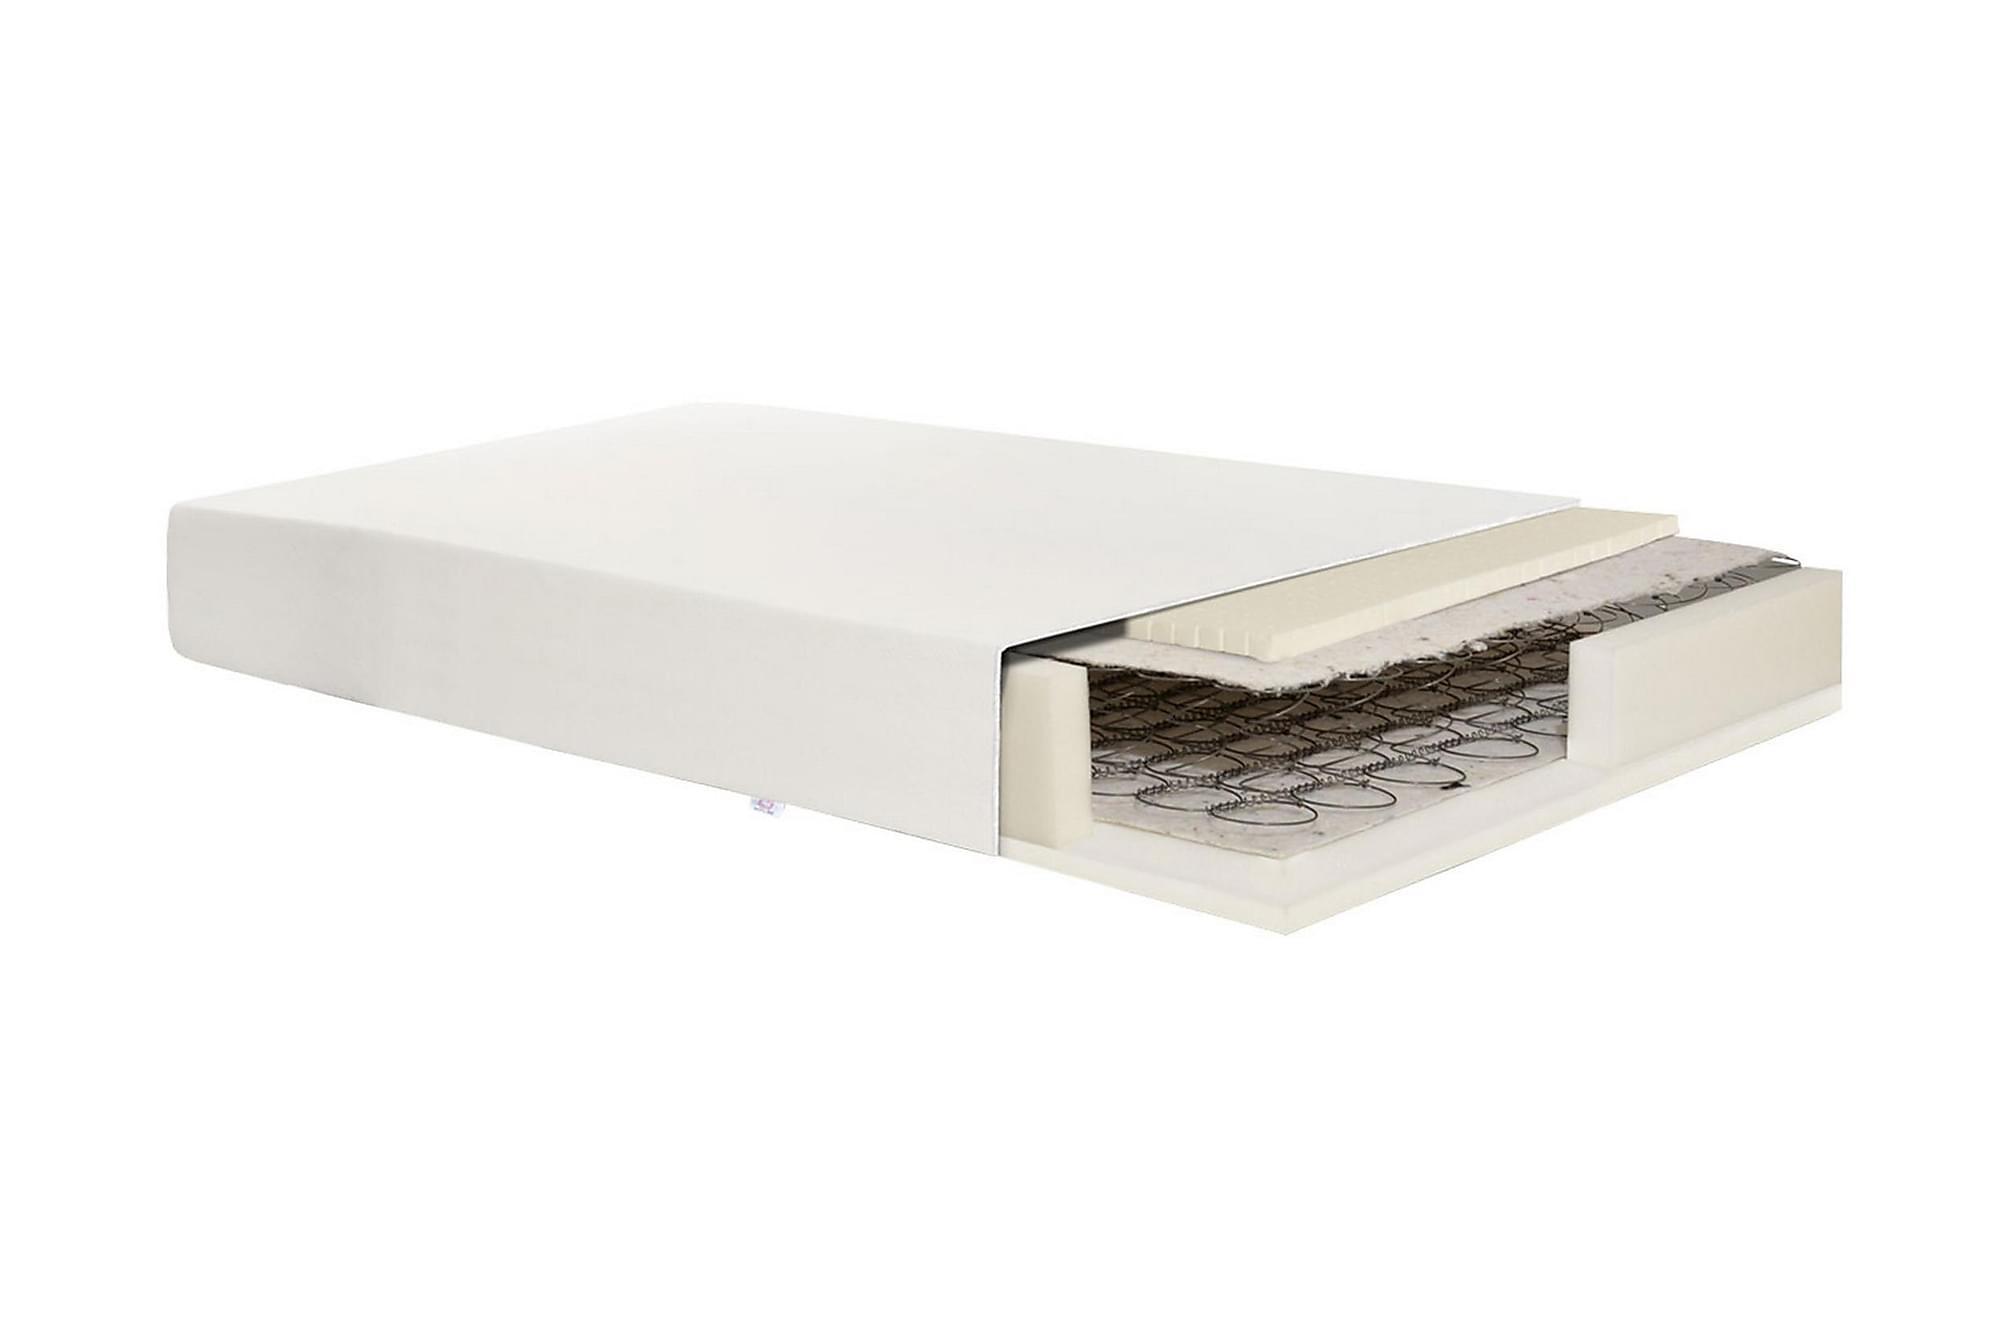 DOLMAR Madrass 195x80x12 Ensidig minibonell jednostronny + l, Resårmadrasser